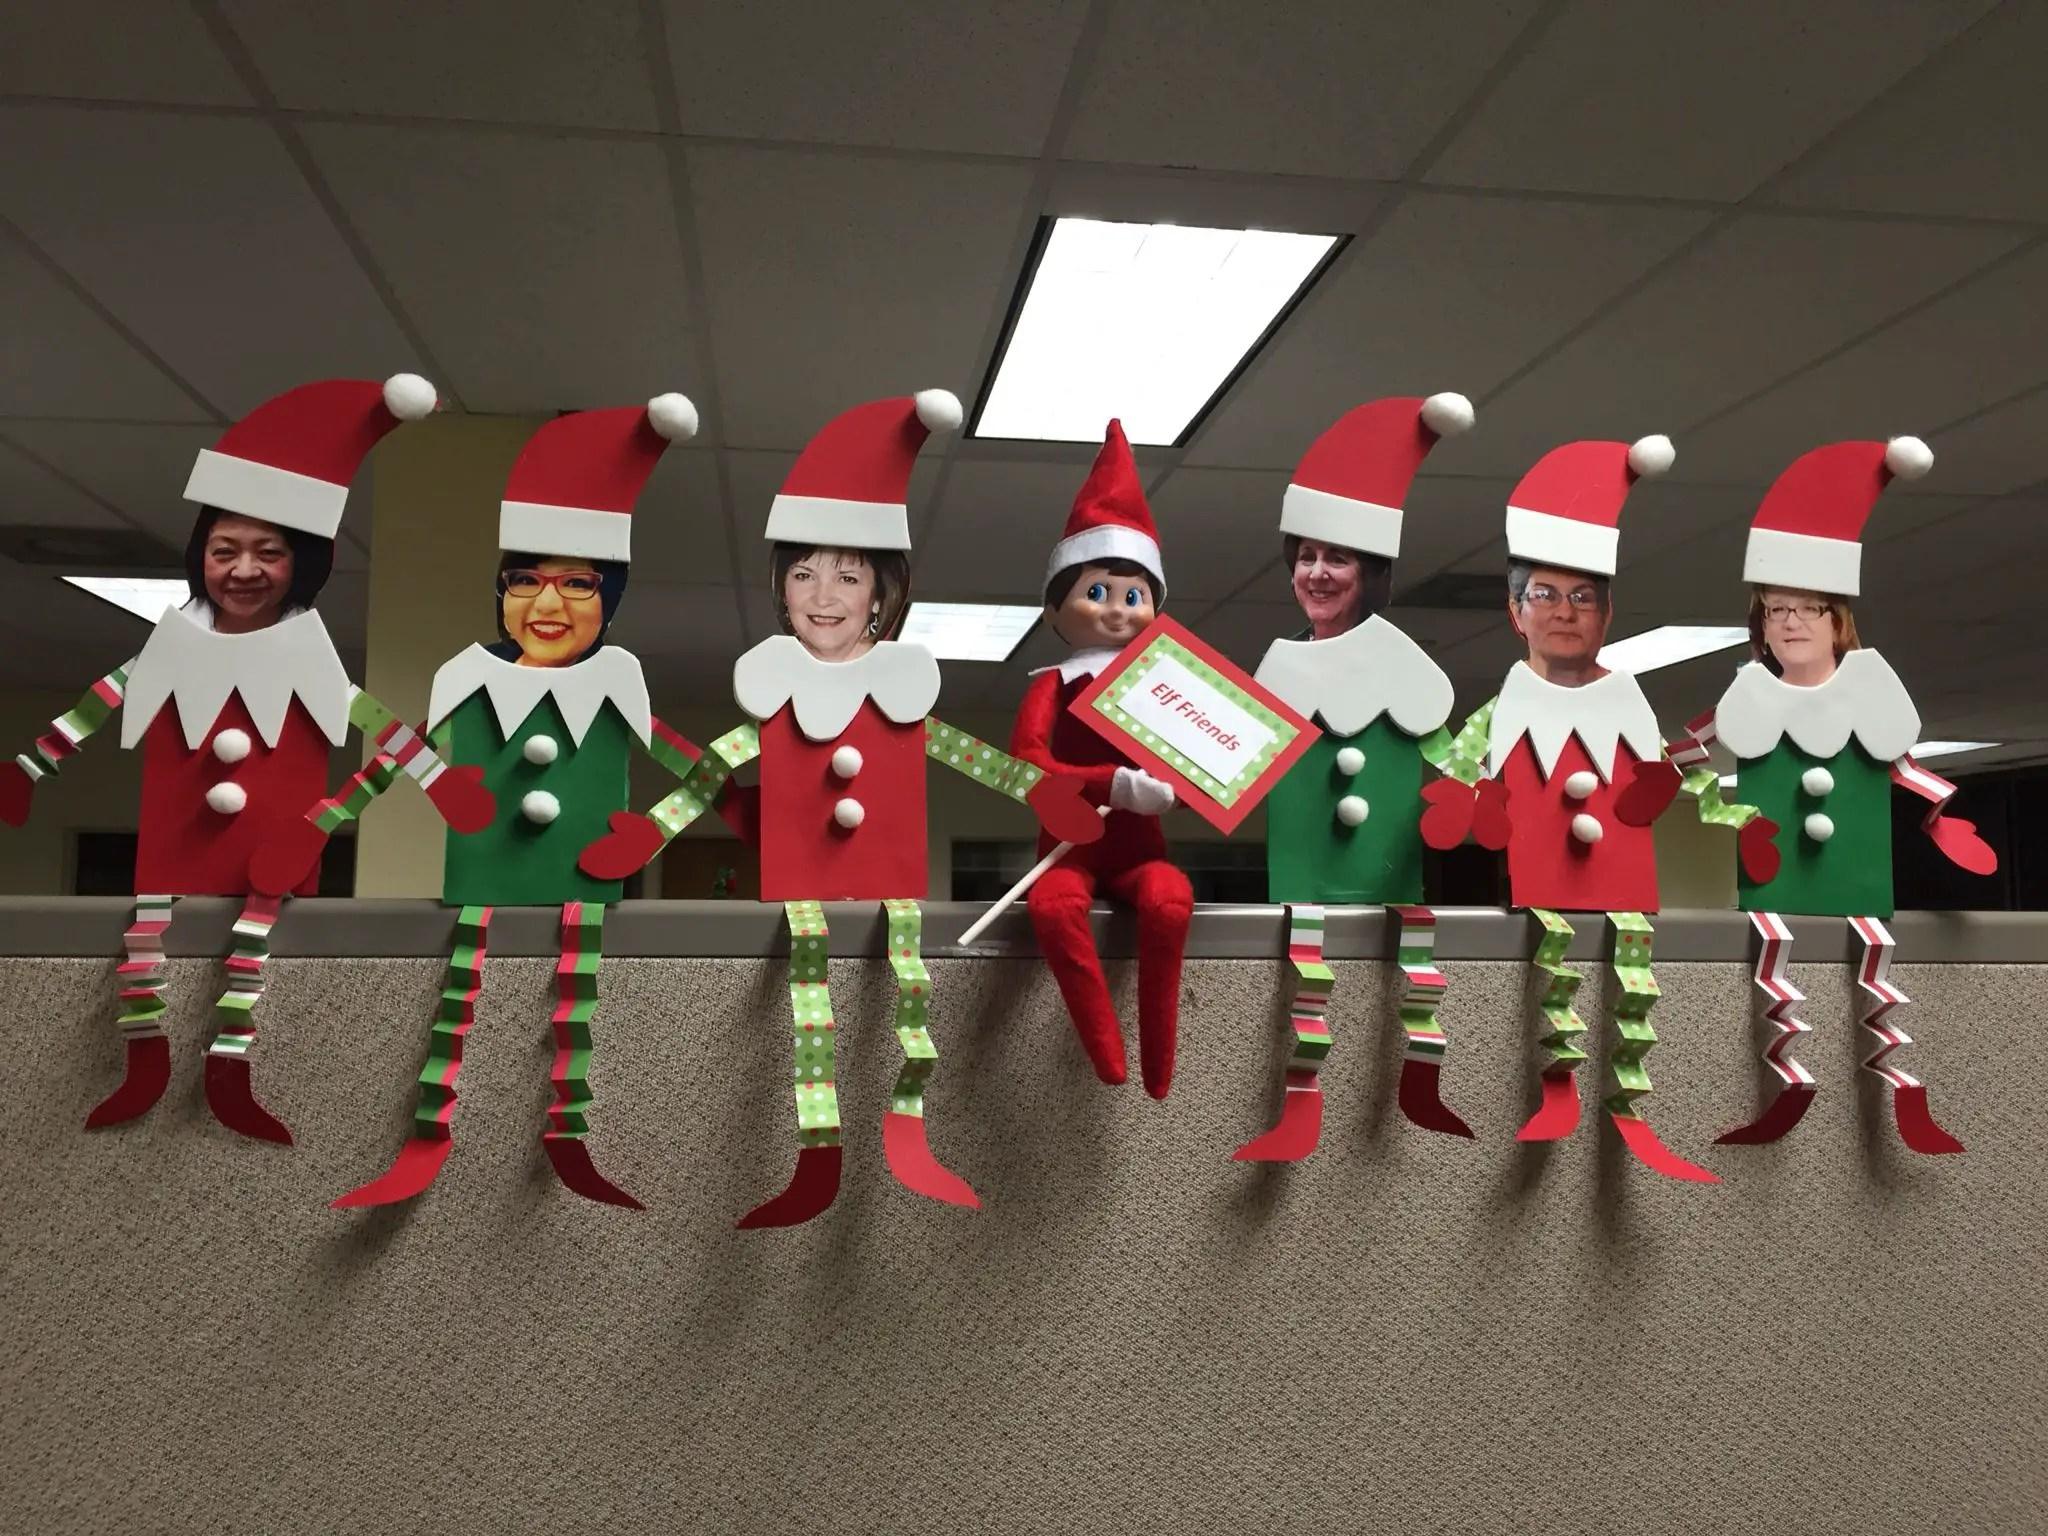 20 fice Christmas Decorating Ideas decoratoo